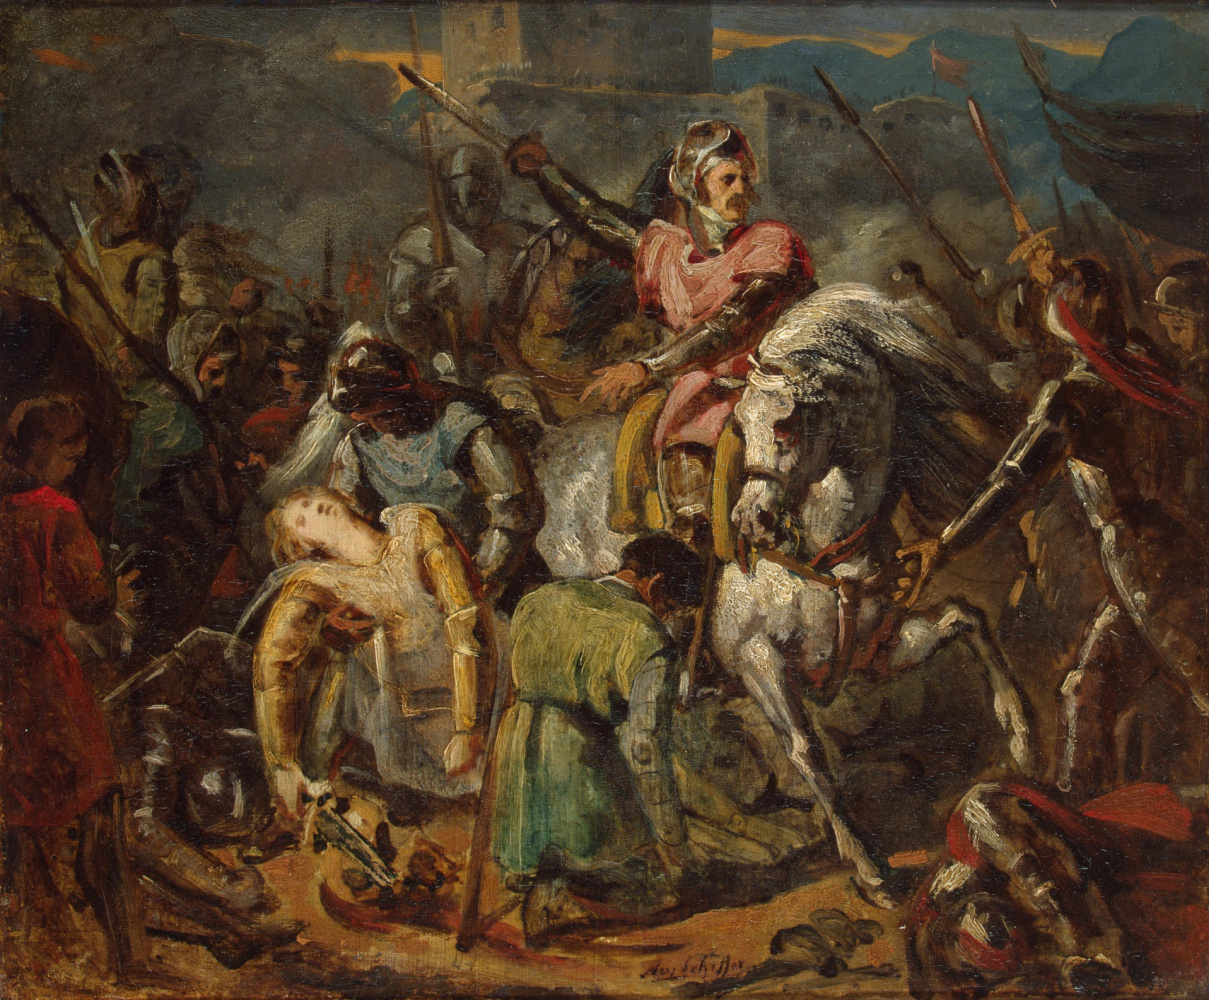 Ари Шеффер. The death of Gaston de Foix at the Battle of Ravenna on April 11, 1512. Sketch